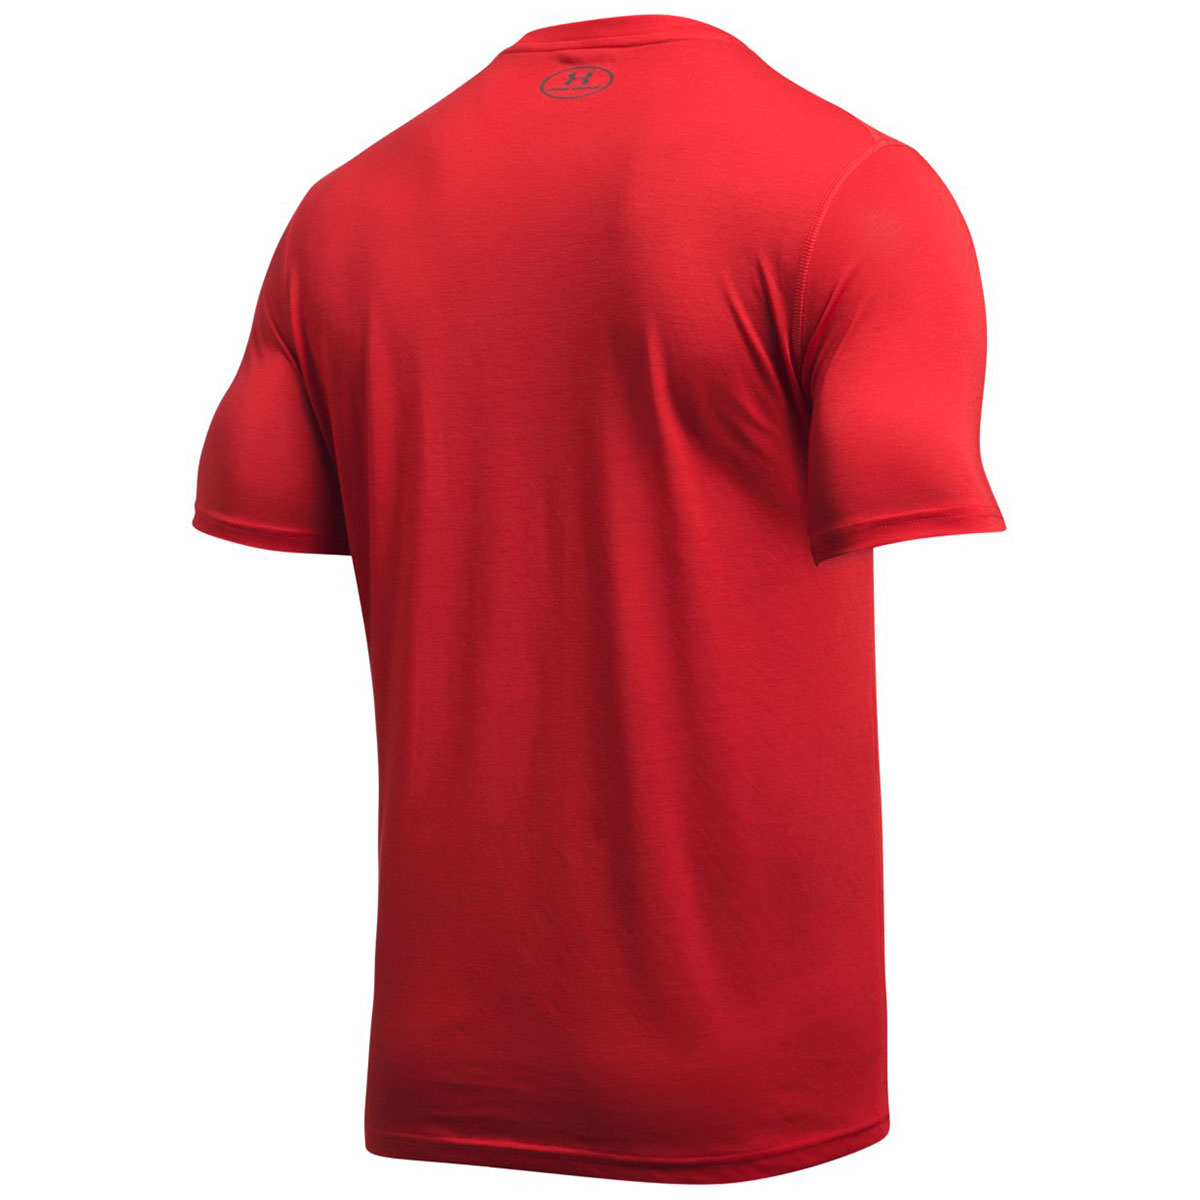 Under-Armour-Mens-UA-Threadborne-Fitted-Short-Sleeve-Gym-Tee-Sport-T-Shirt thumbnail 32